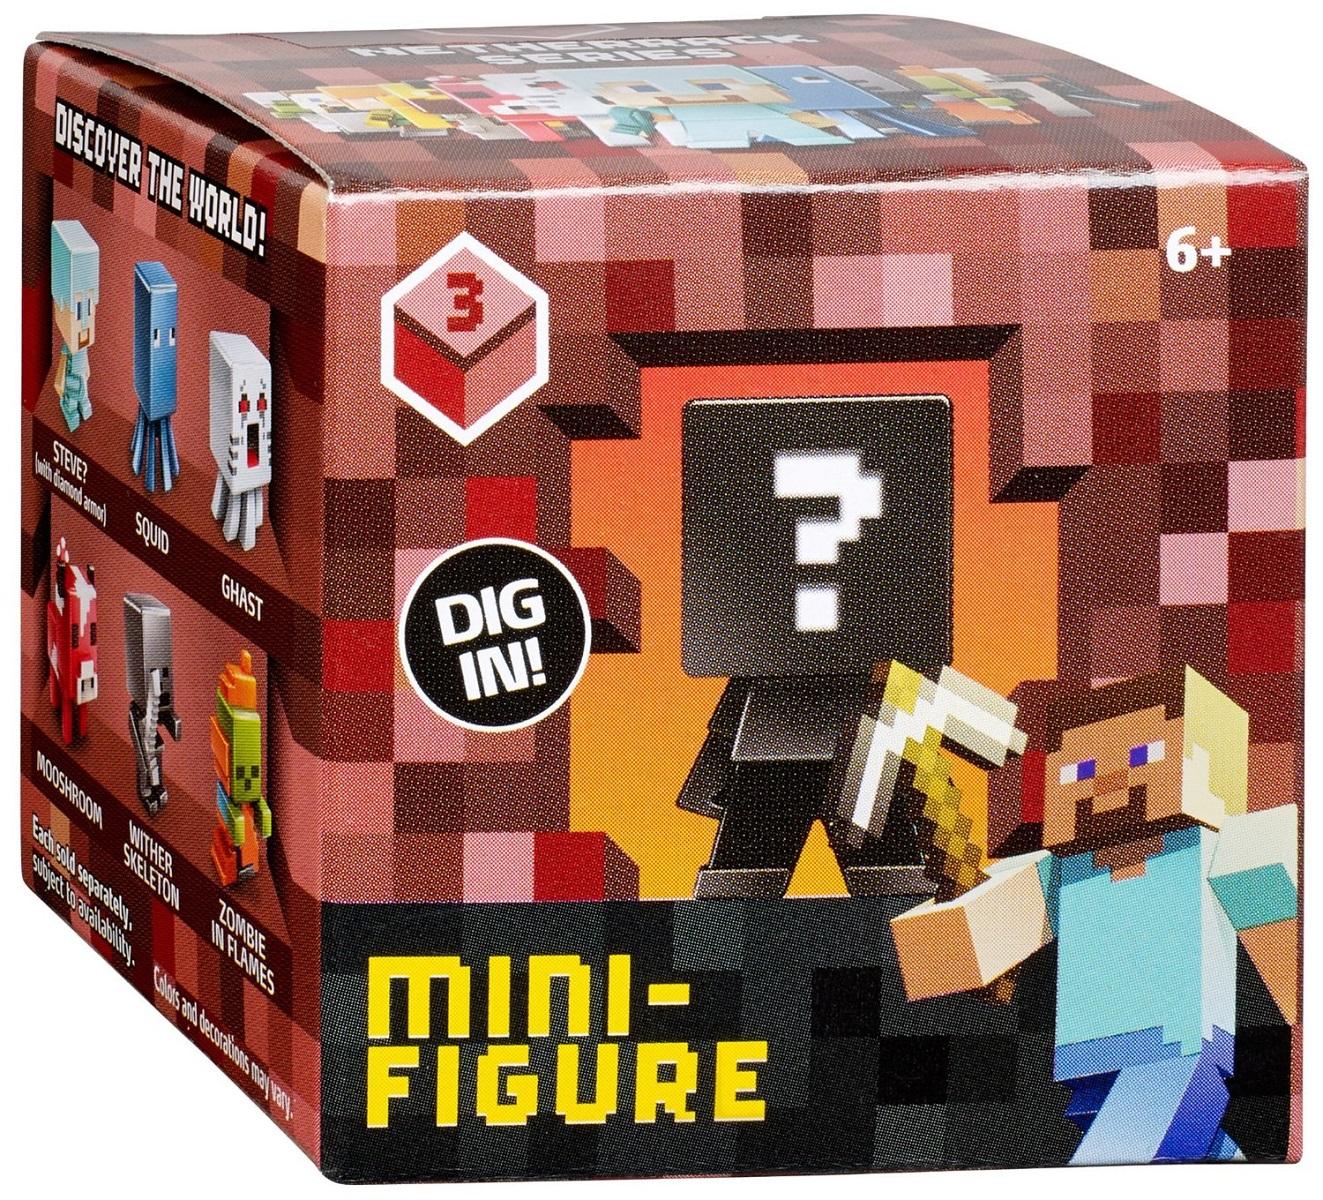 Minecraft マインクラフトコレクティブルフィギュアミステリーボックス2|なかのふぁくとりー 楽天市場店